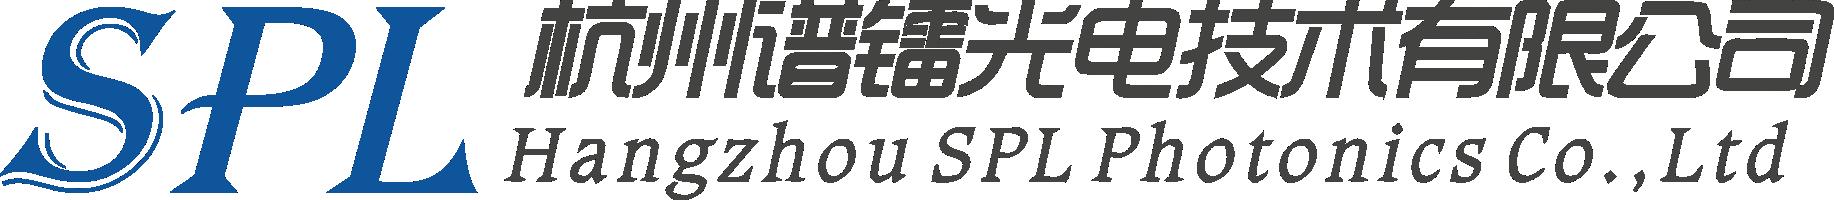 SPL Photonics